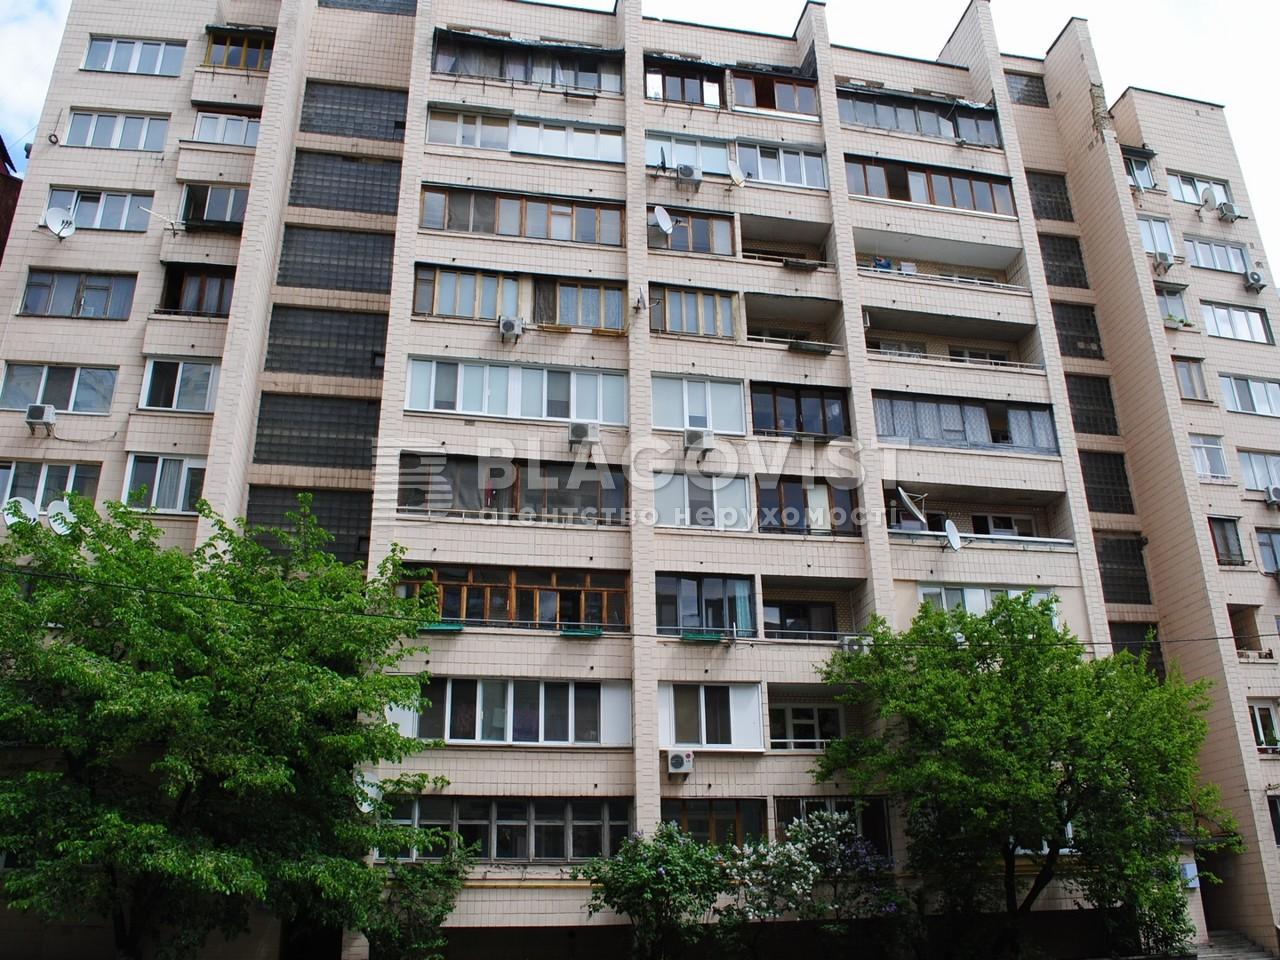 Квартира F-42448, Тургеневская, 70-72, Киев - Фото 1